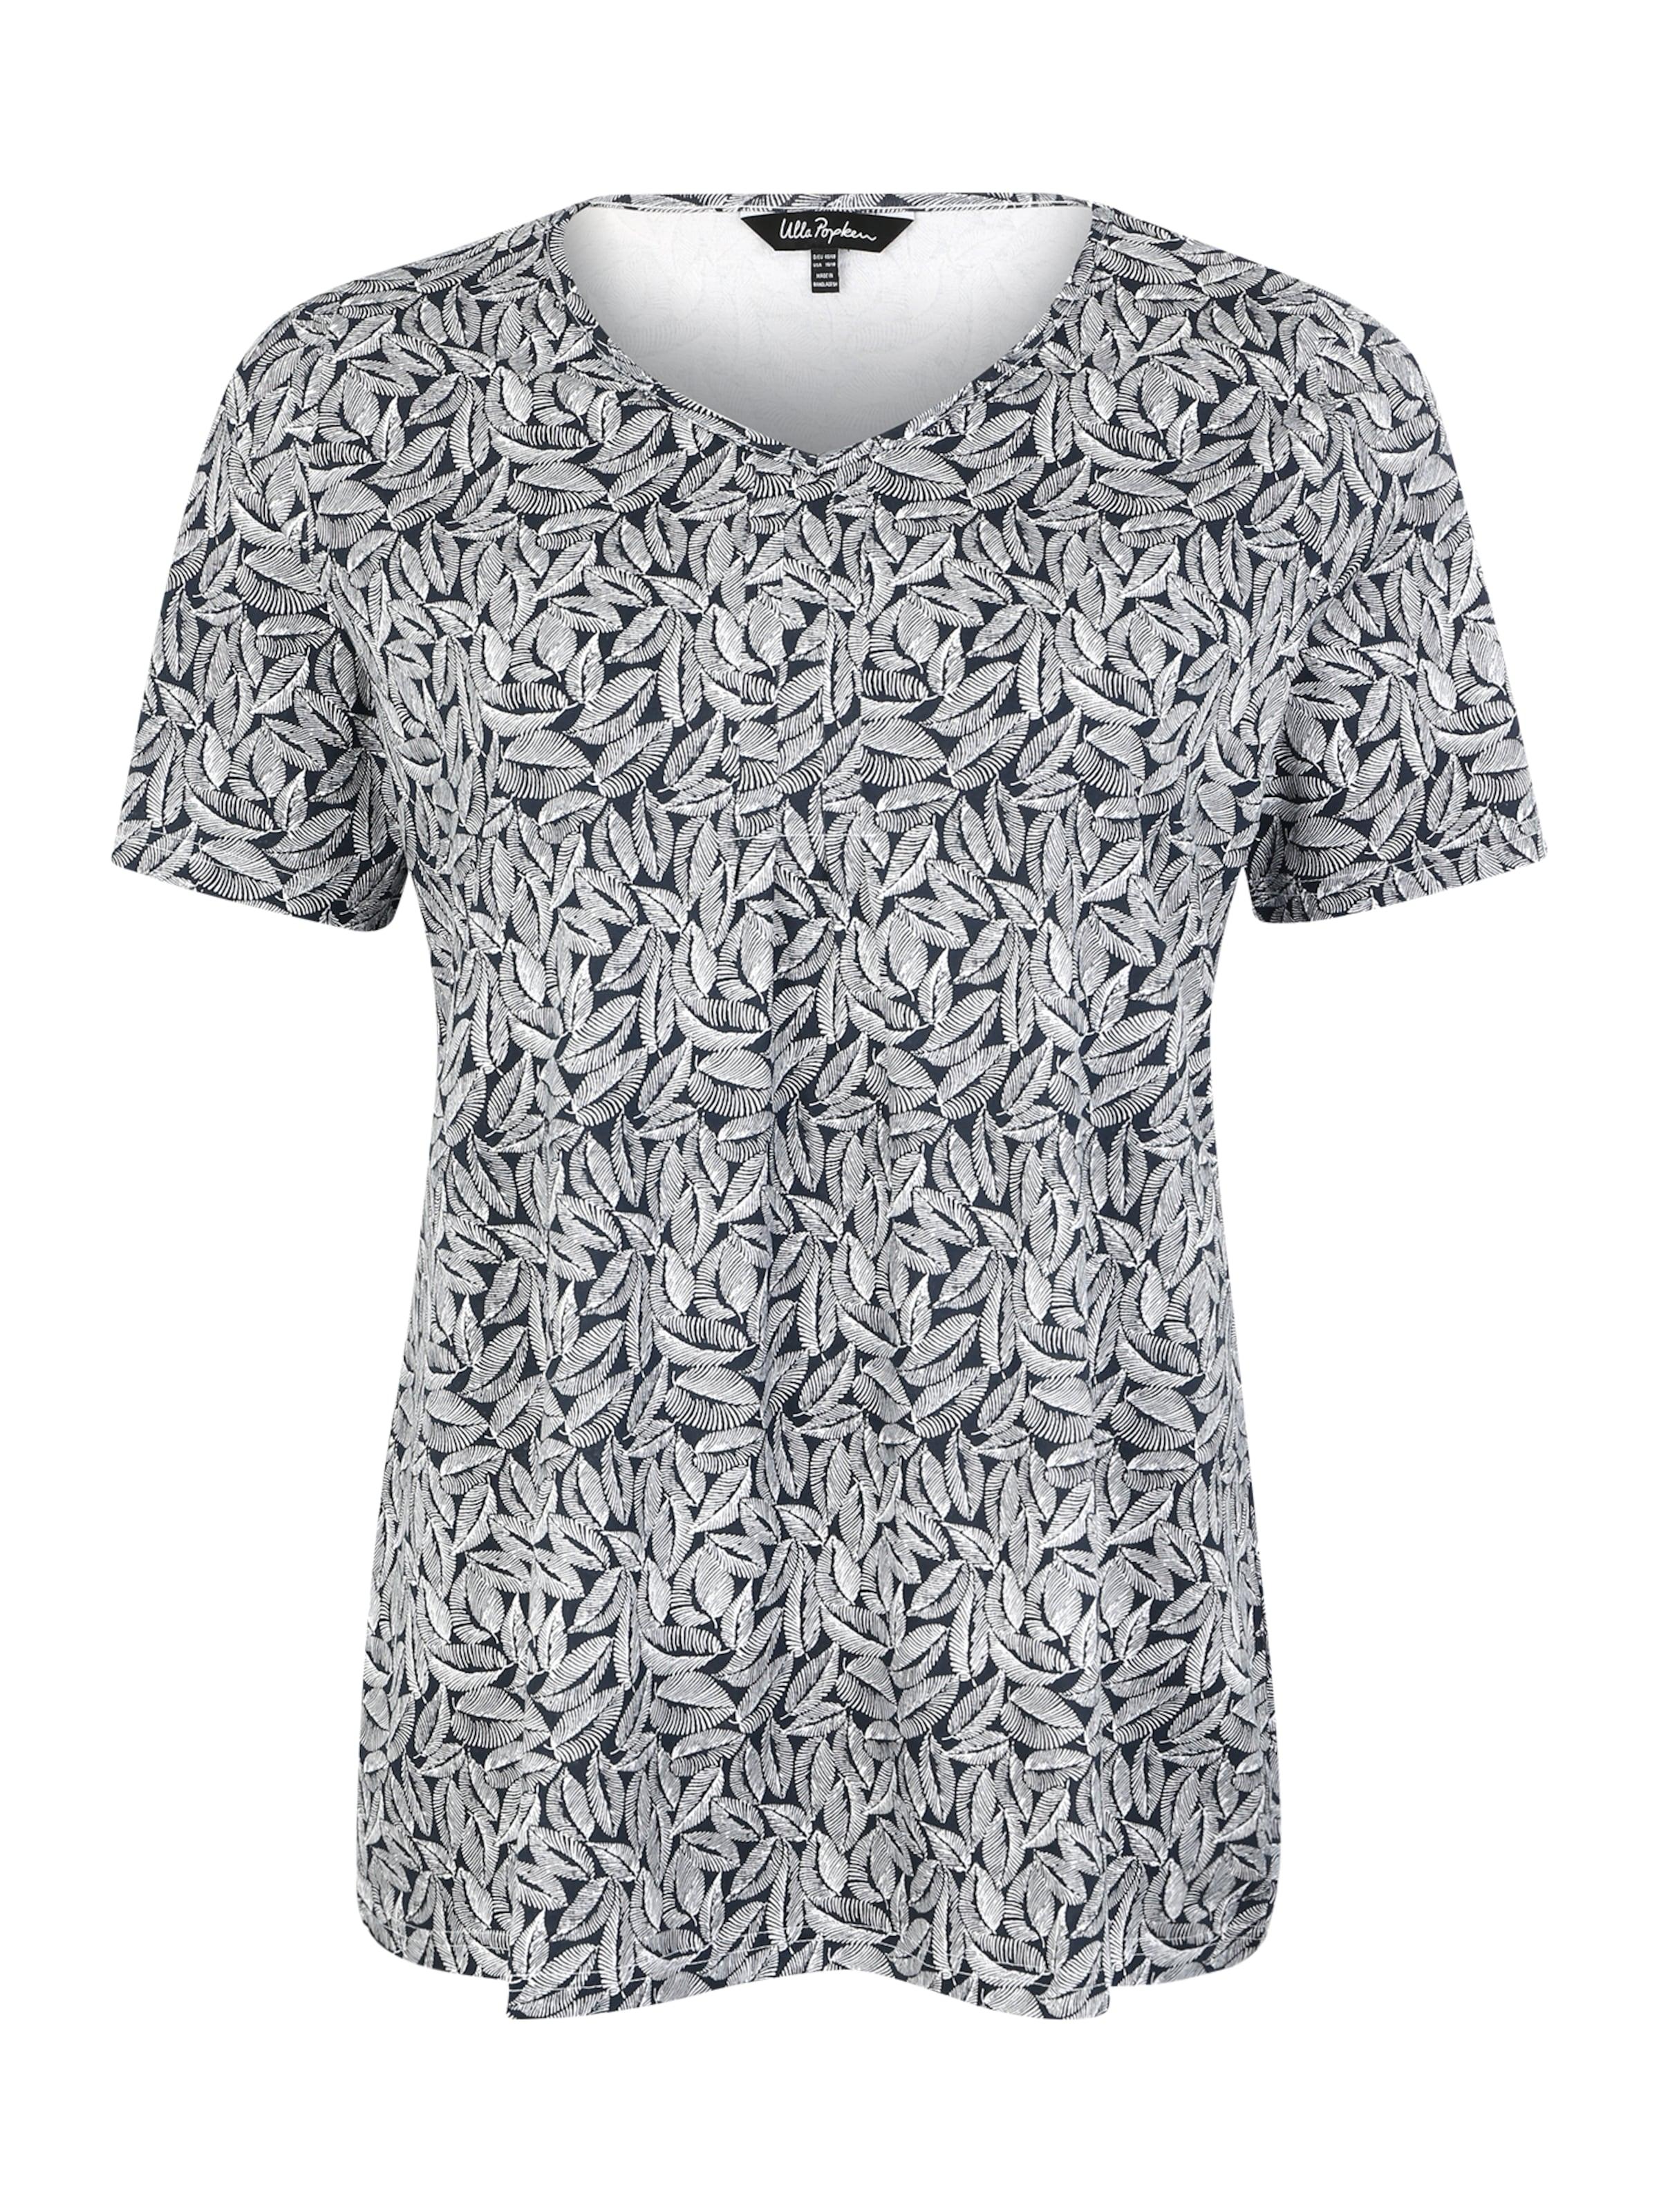 DunkelblauWeiß Popken In Ulla 'minimal' Shirt qSVMUzp